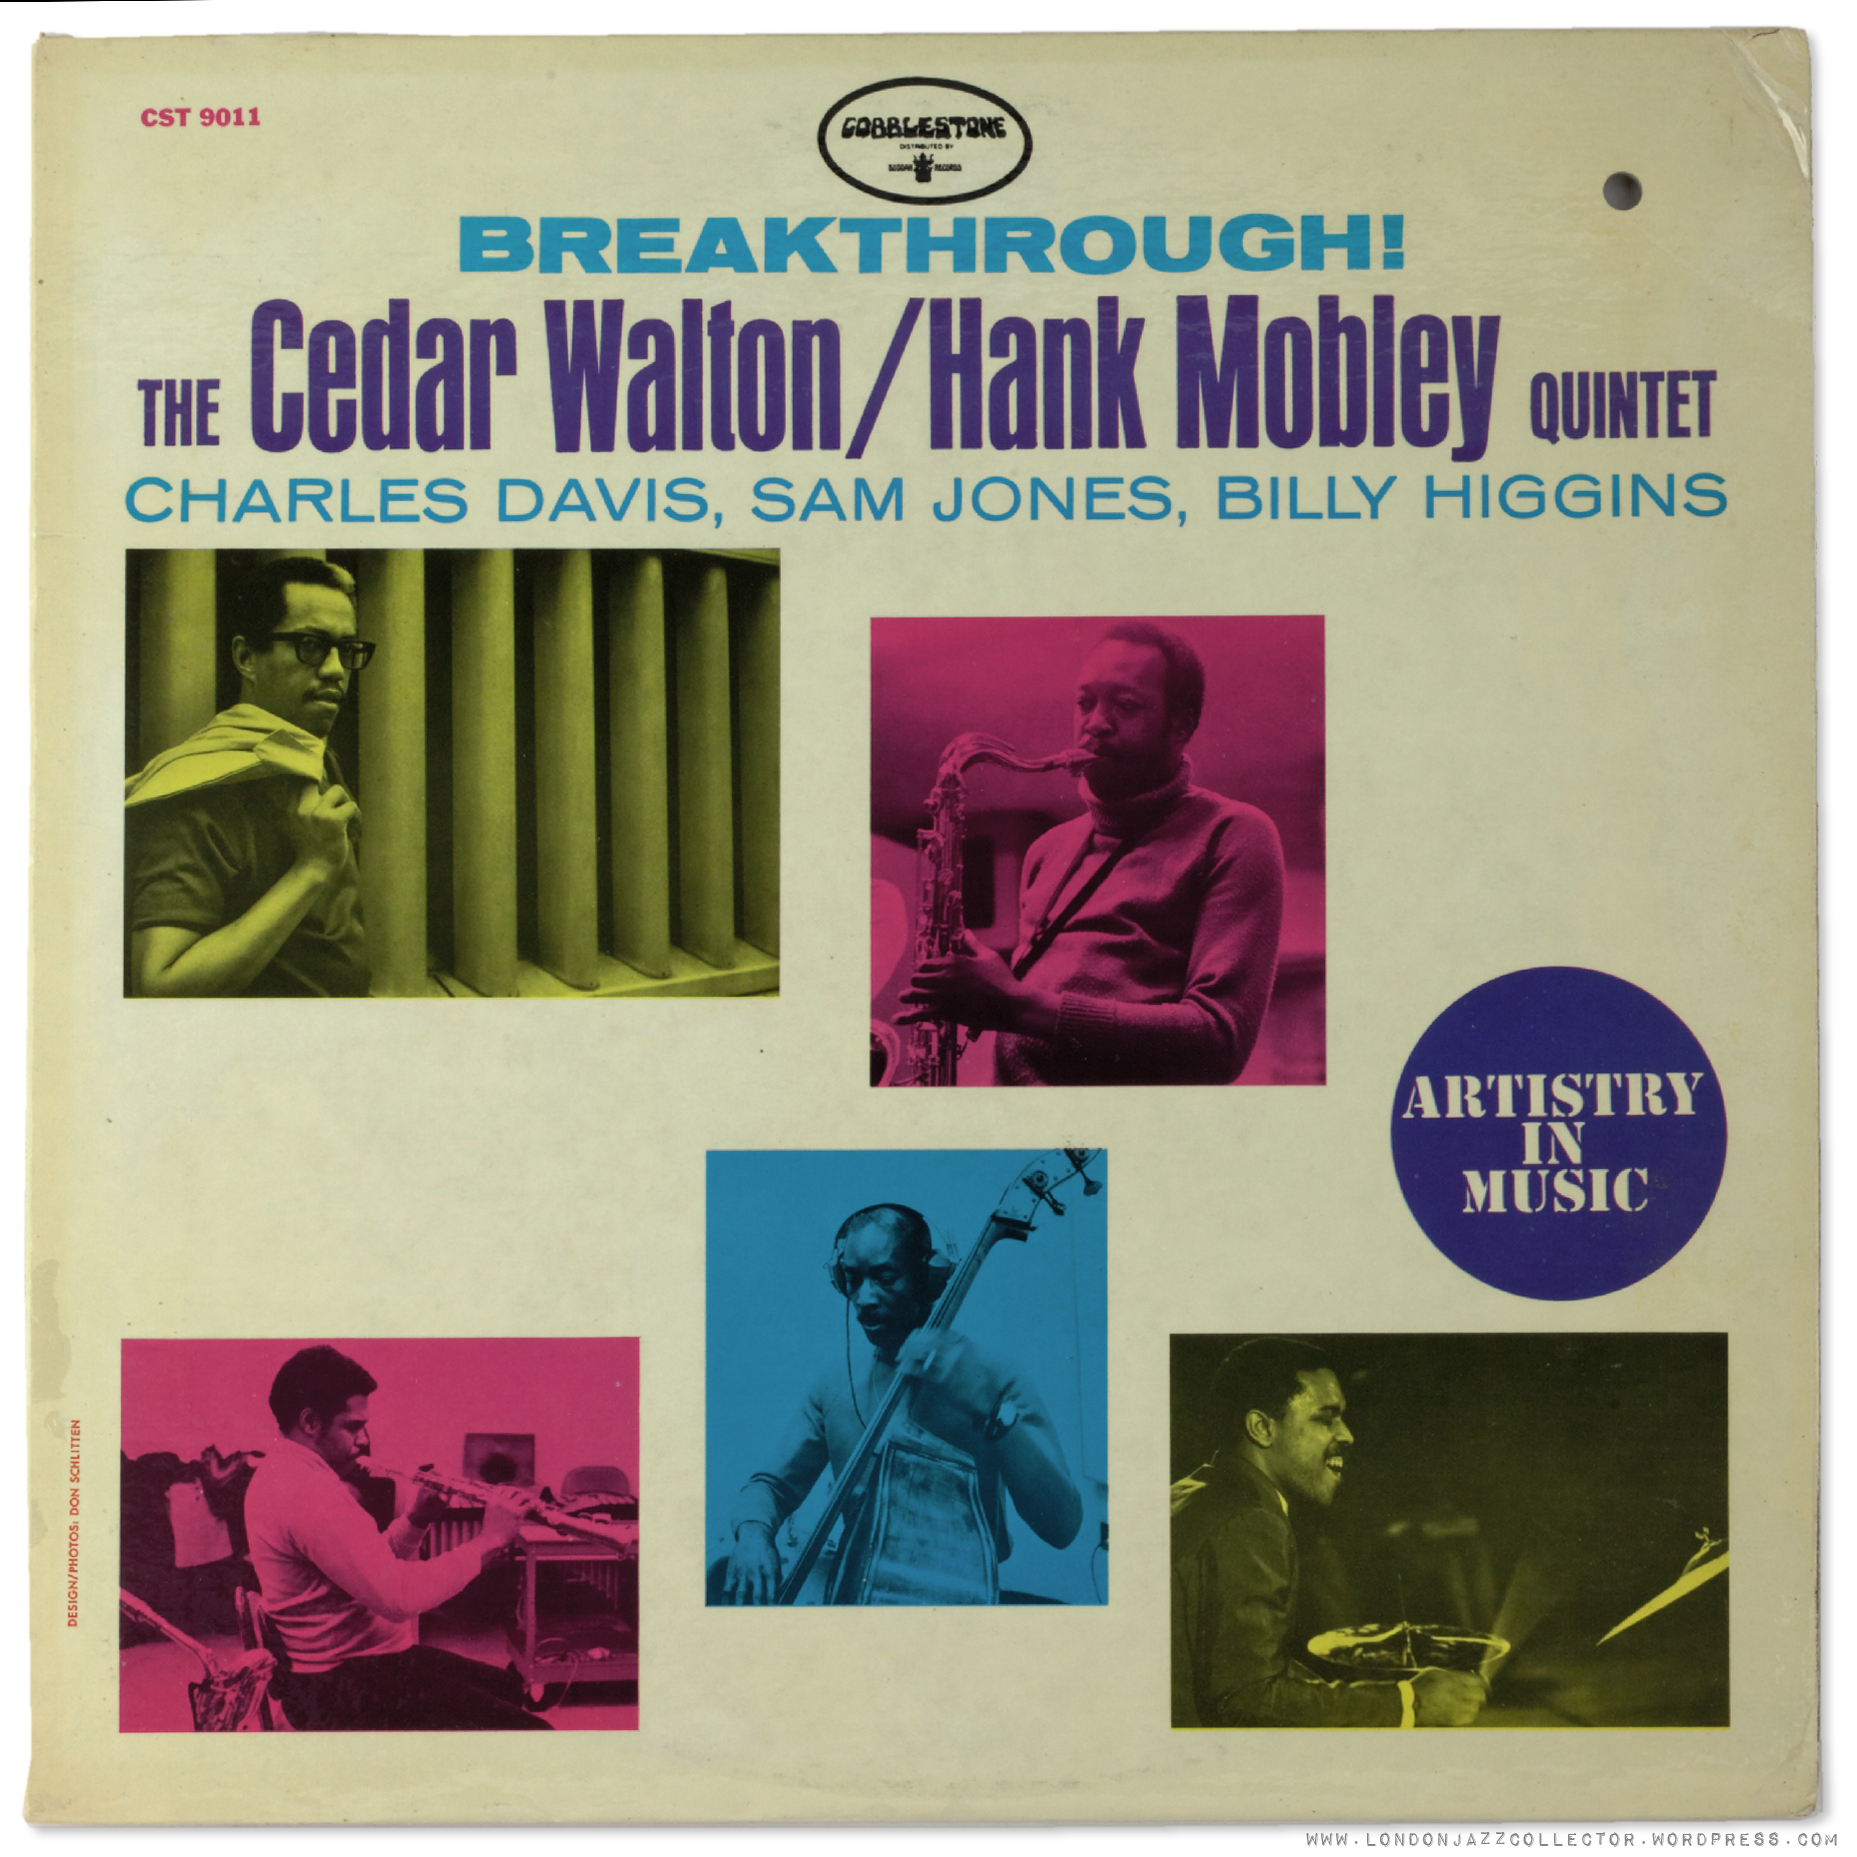 cedar-walton-hank-mobley-breakthrough-cover-1800-ljc.jpg